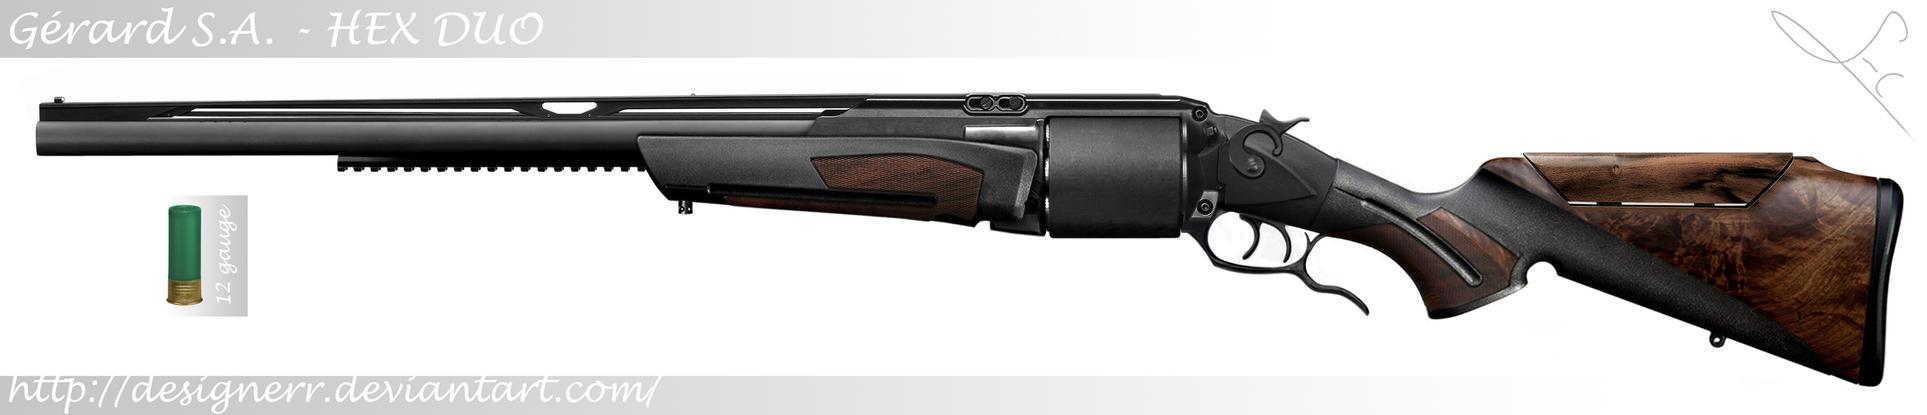 HEX DUO (revolving double barrel shotgun) by Designerr